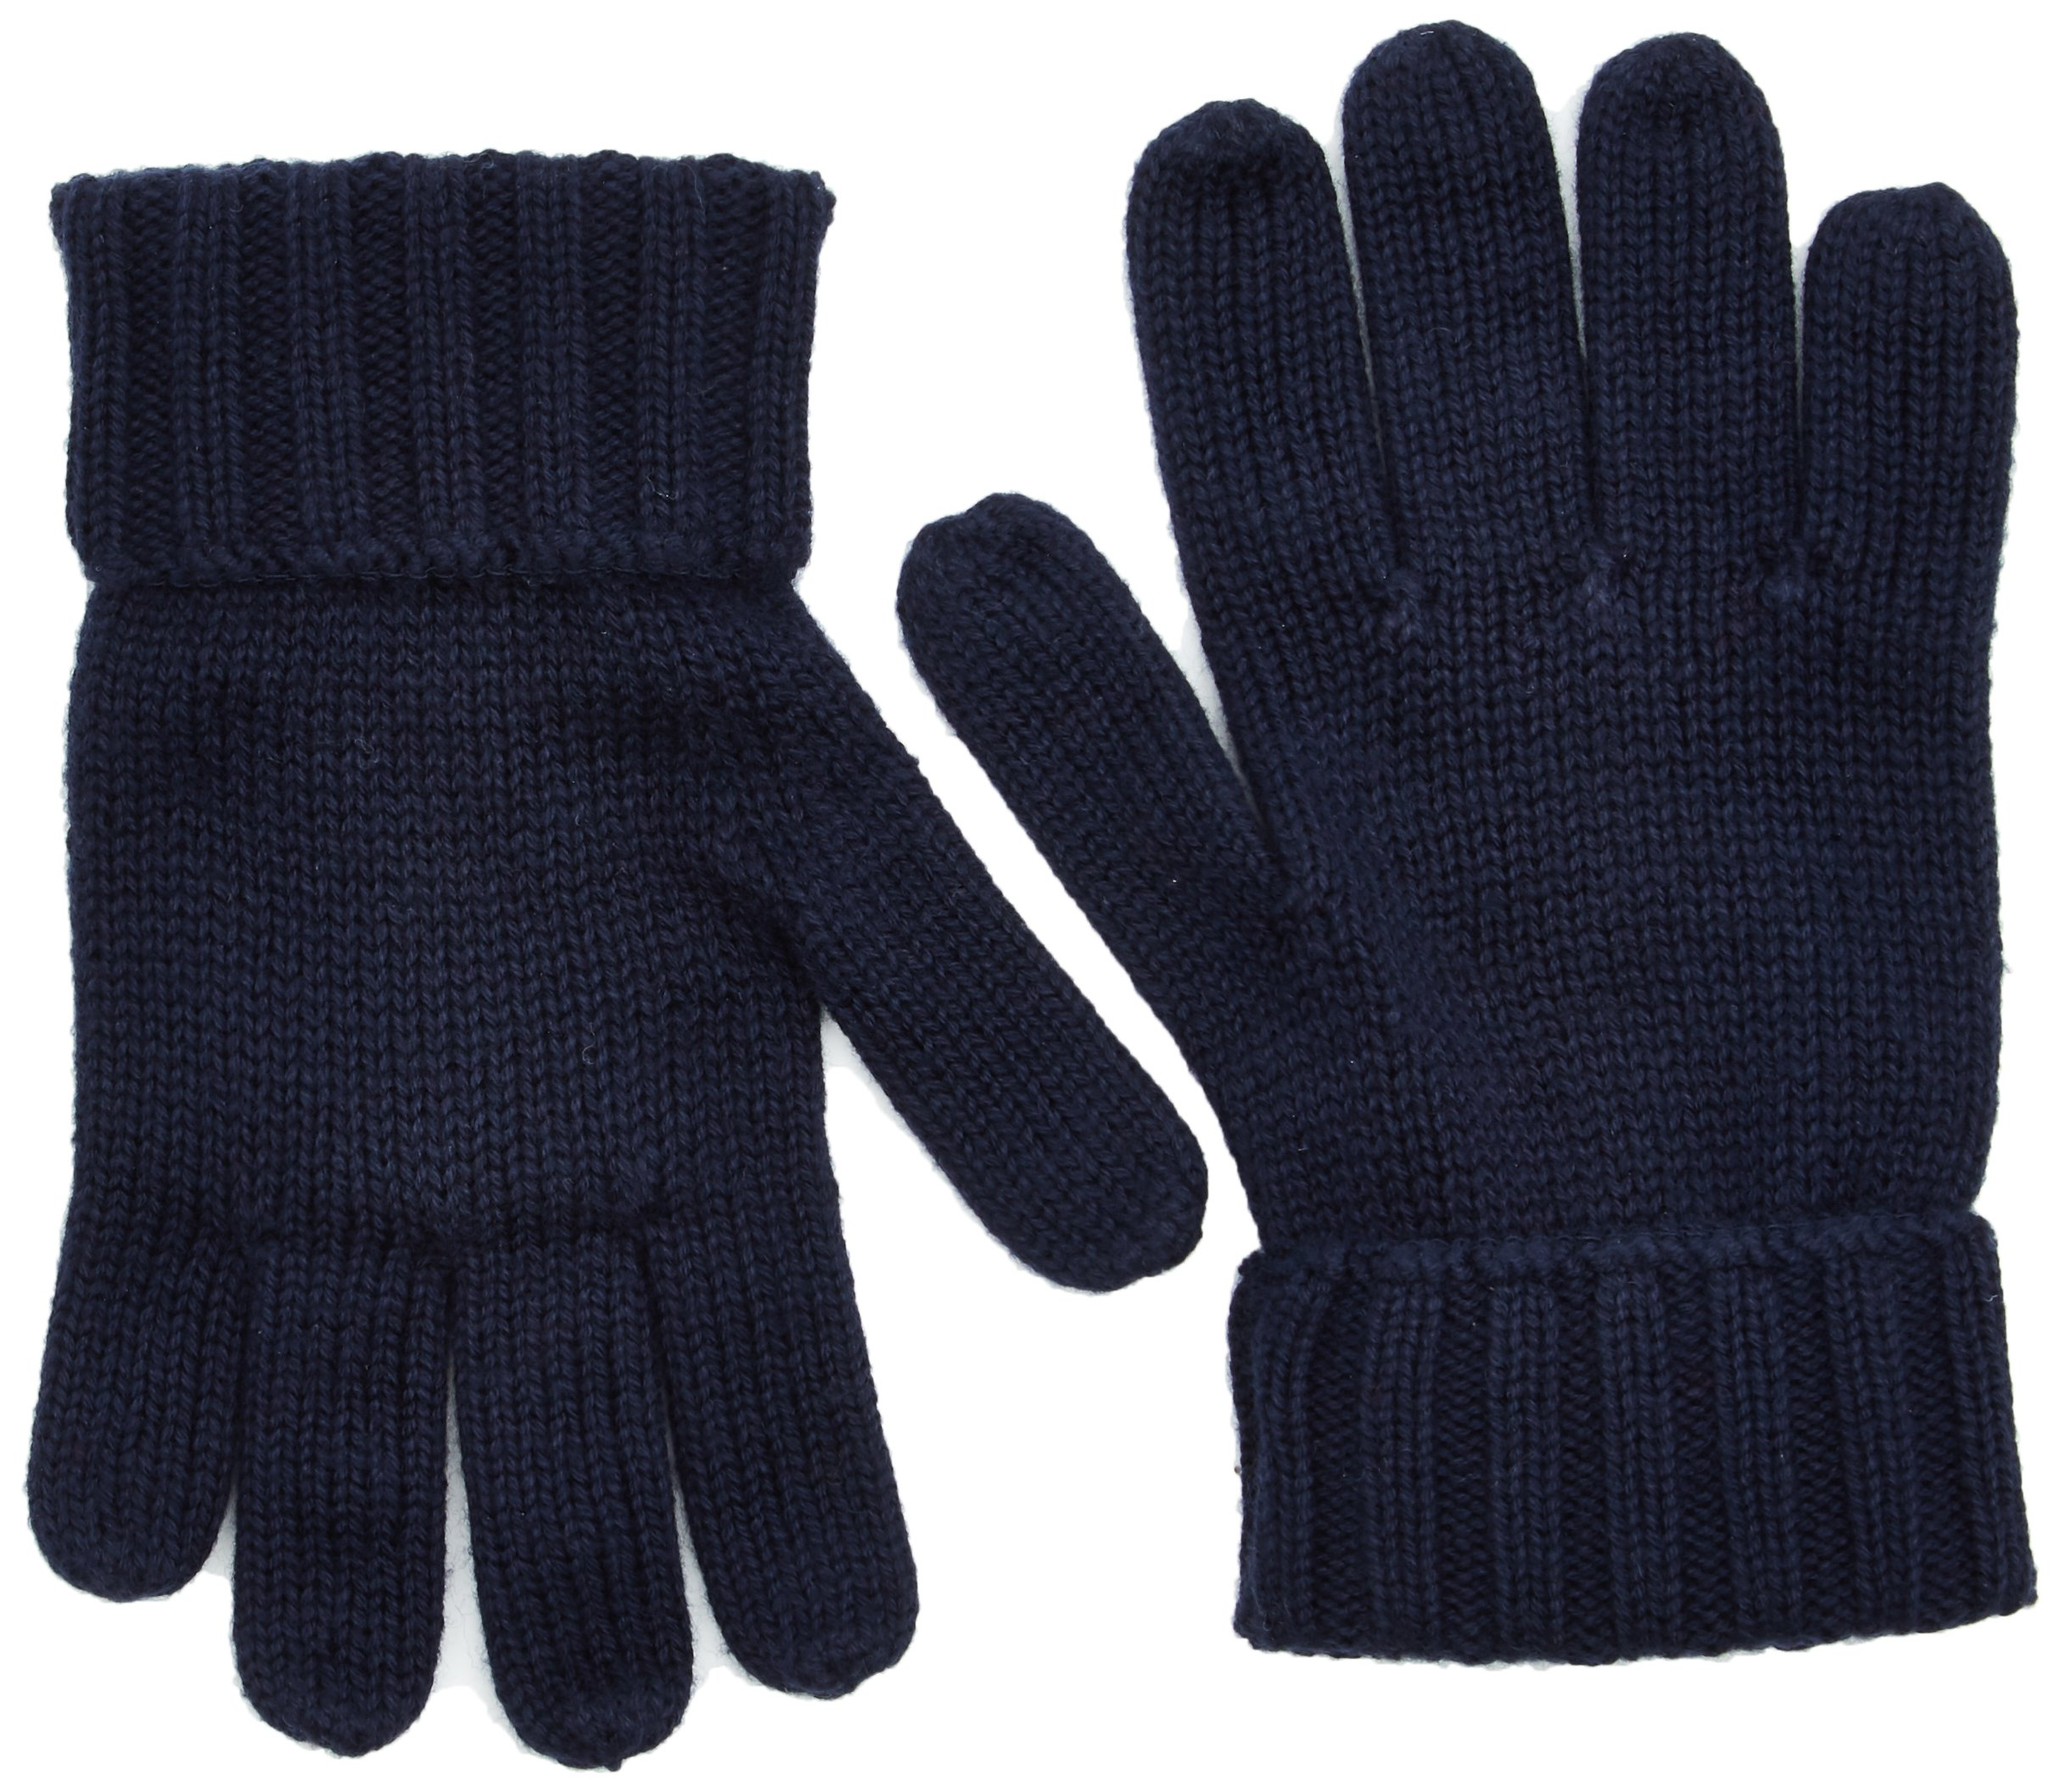 Tommy Hilfiger Cotton Cashmere Gloves Guantes para Niños